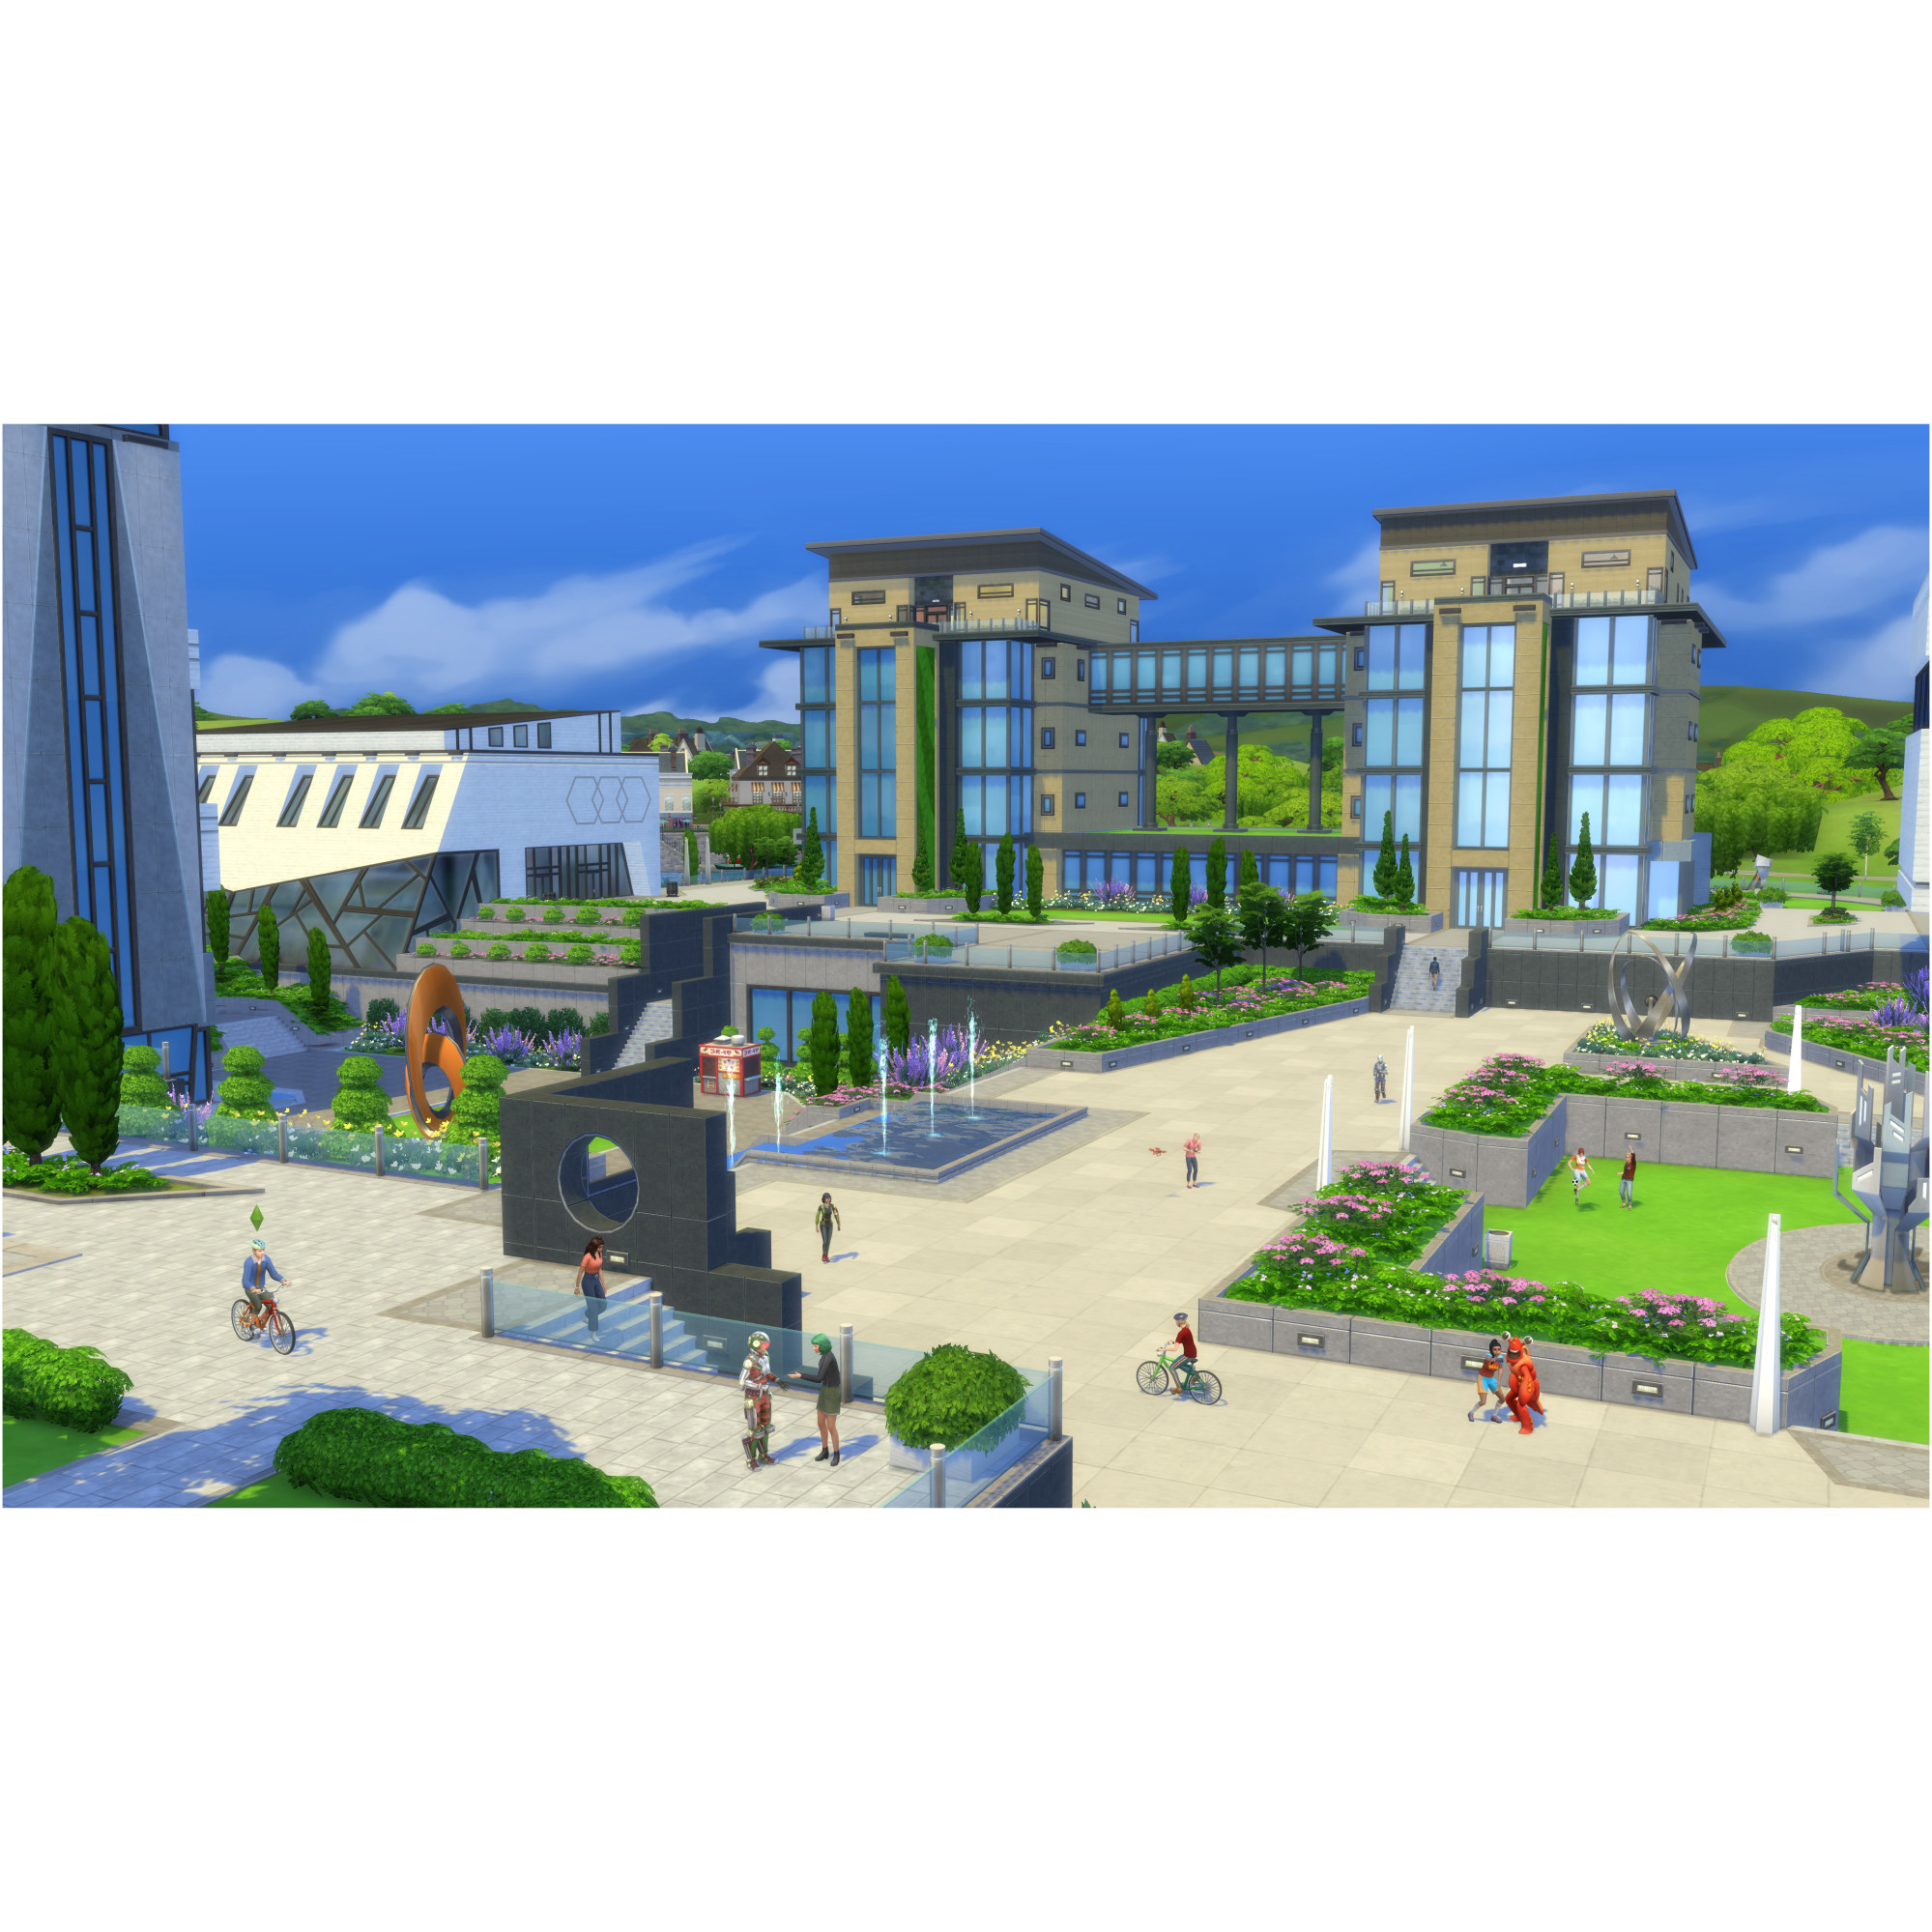 Expansiune The Sims 4 EP8 Discover University pentru PC 3